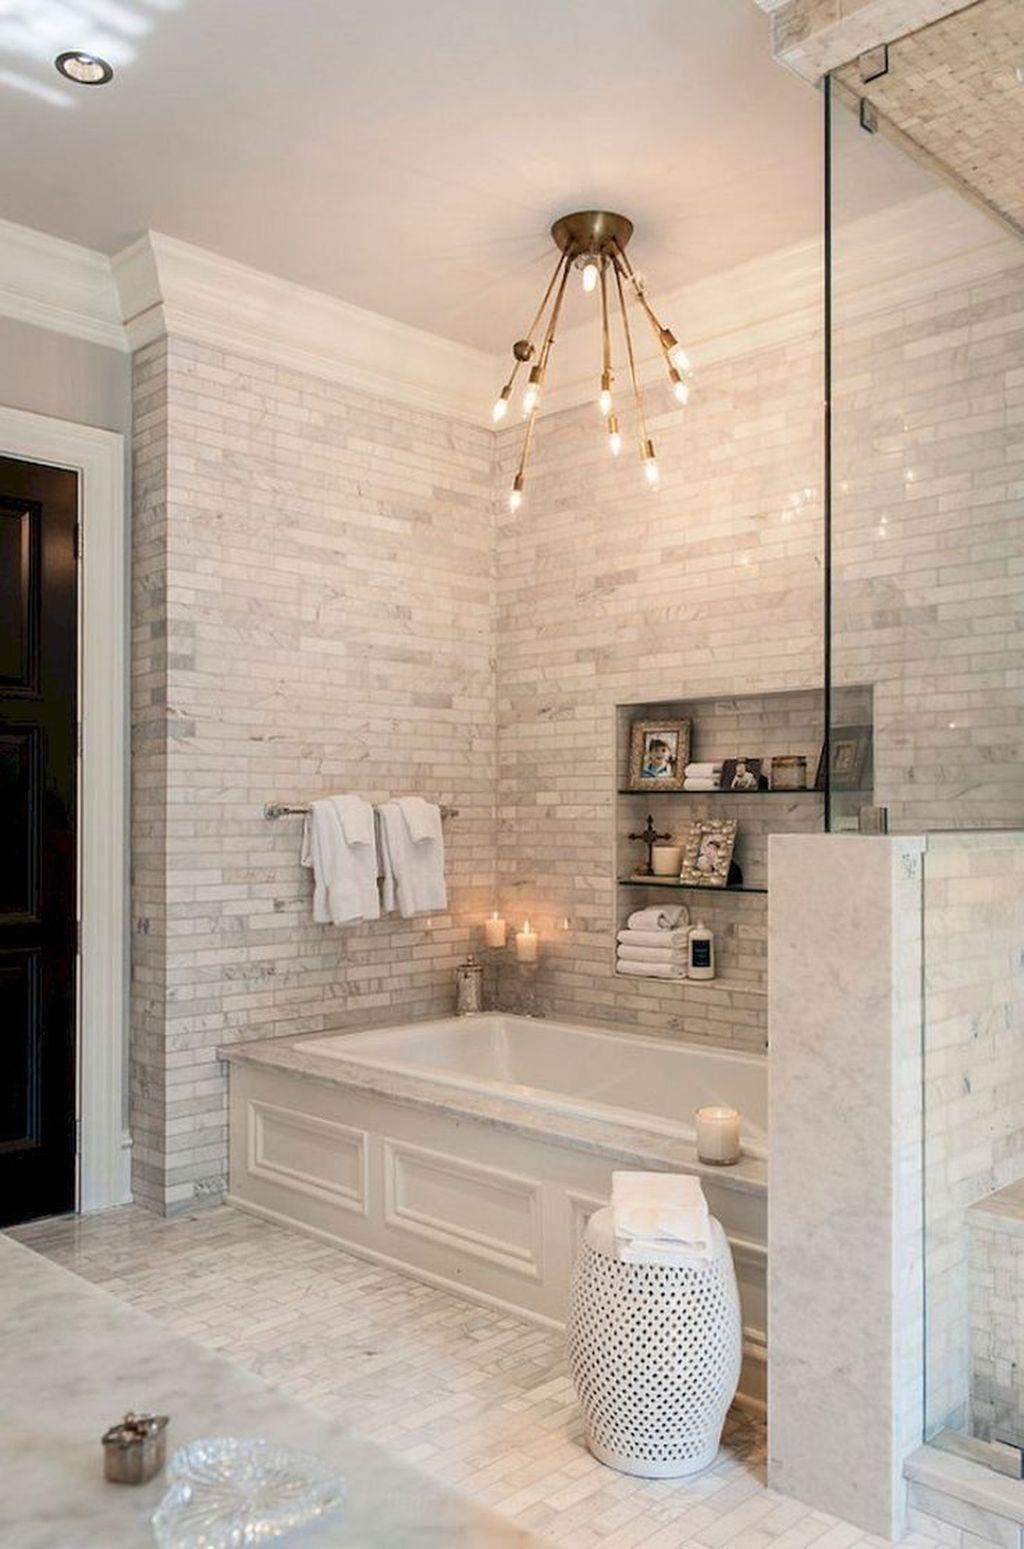 Inspiring Bathroom Tile Ideas 20